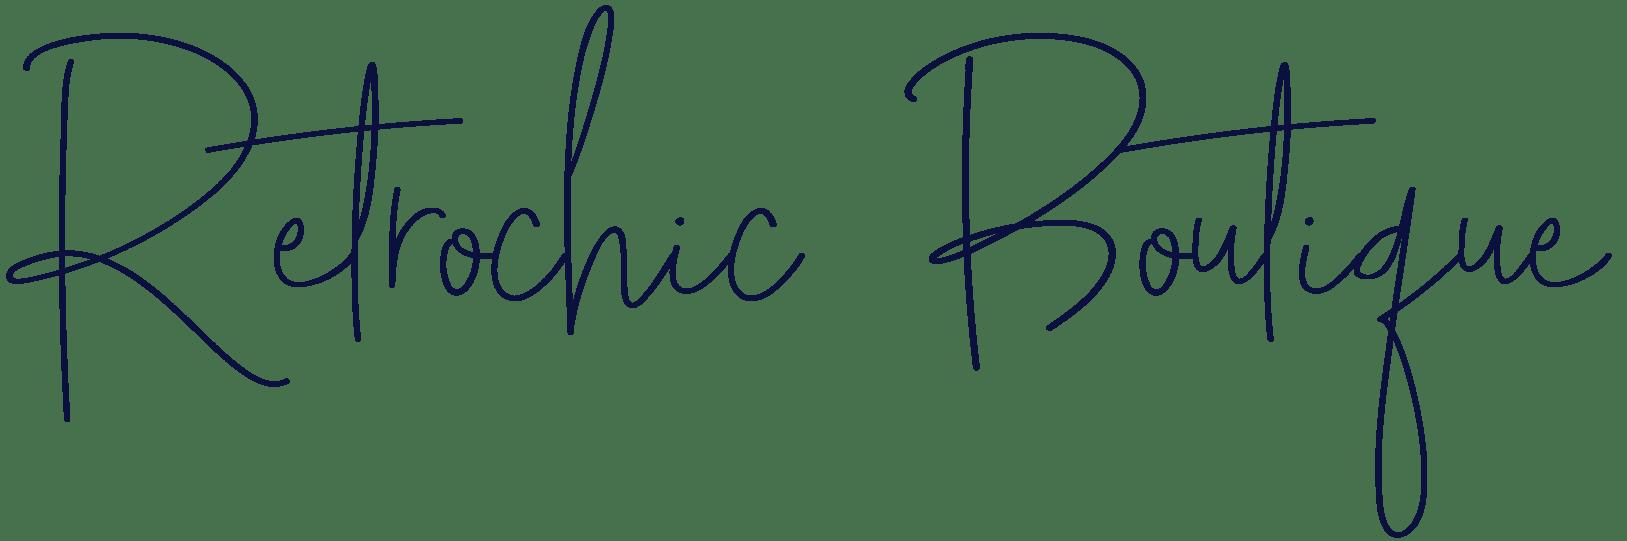 Texte Retrochic Boutique calligraphie